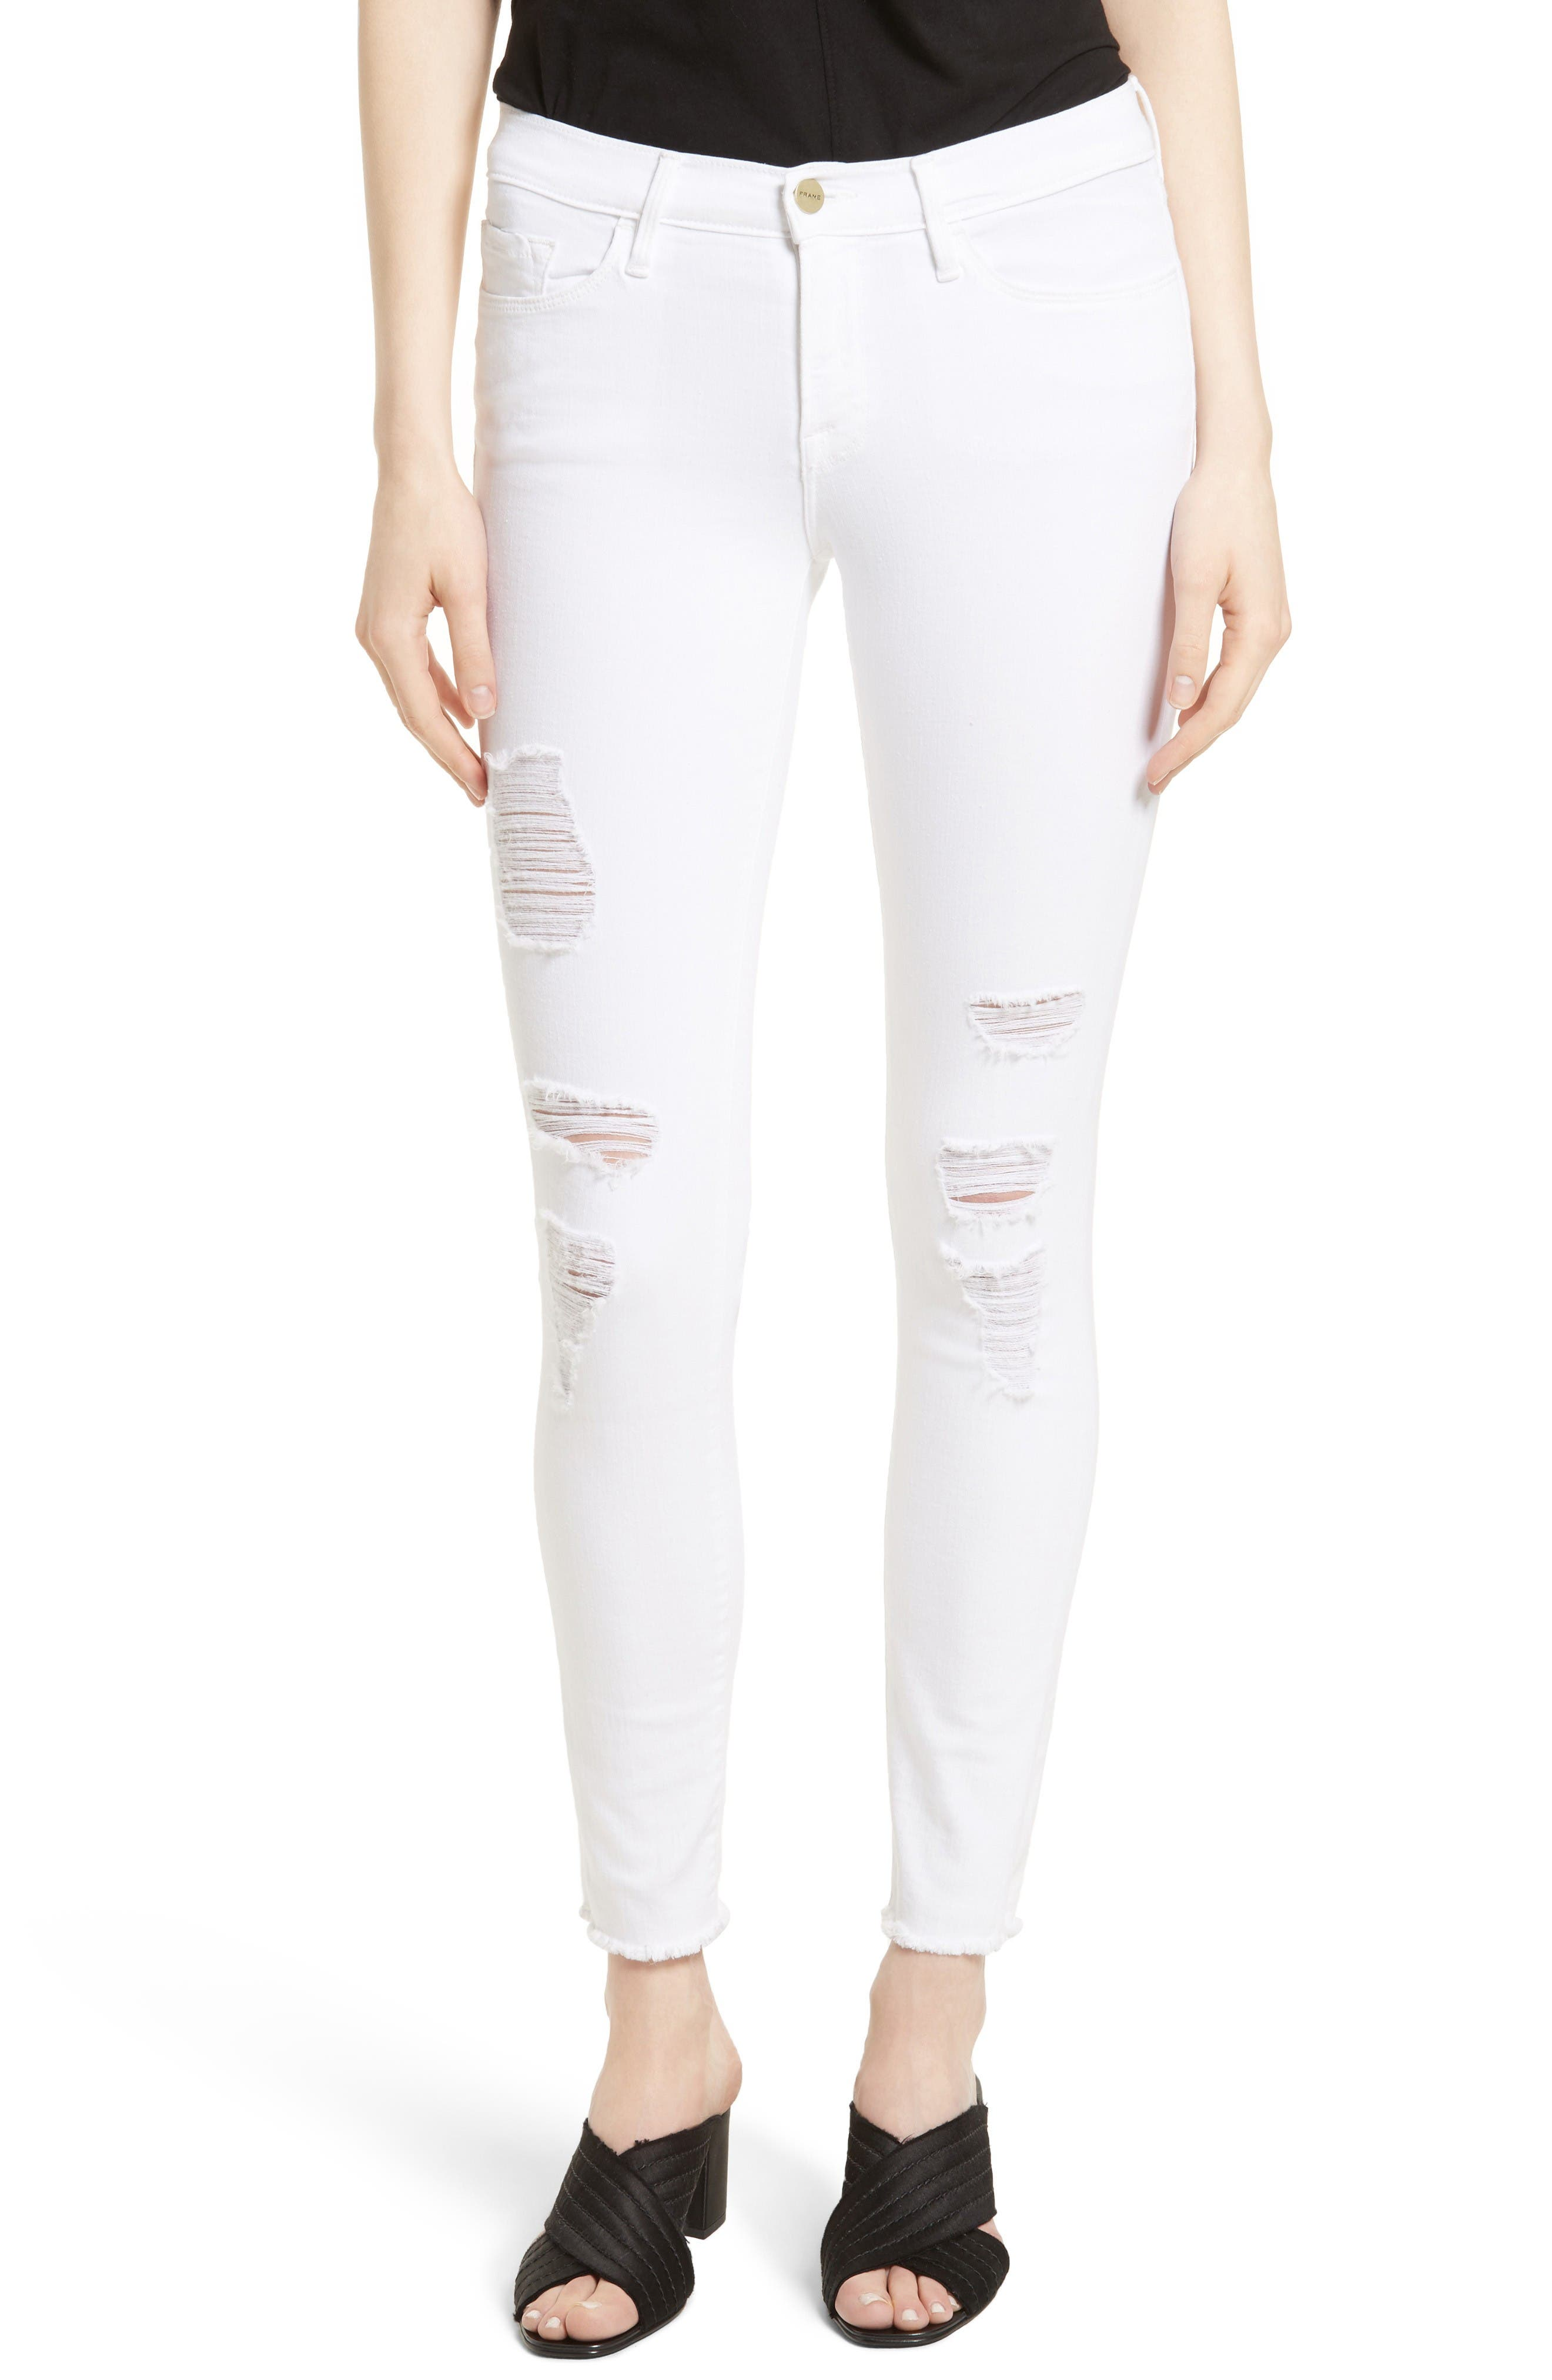 Alternate Image 1 Selected - FRAME 'Le Skinny de Jeanne' Ripped Jeans (Noir Jefferson) (Nordstrom Exclusive)